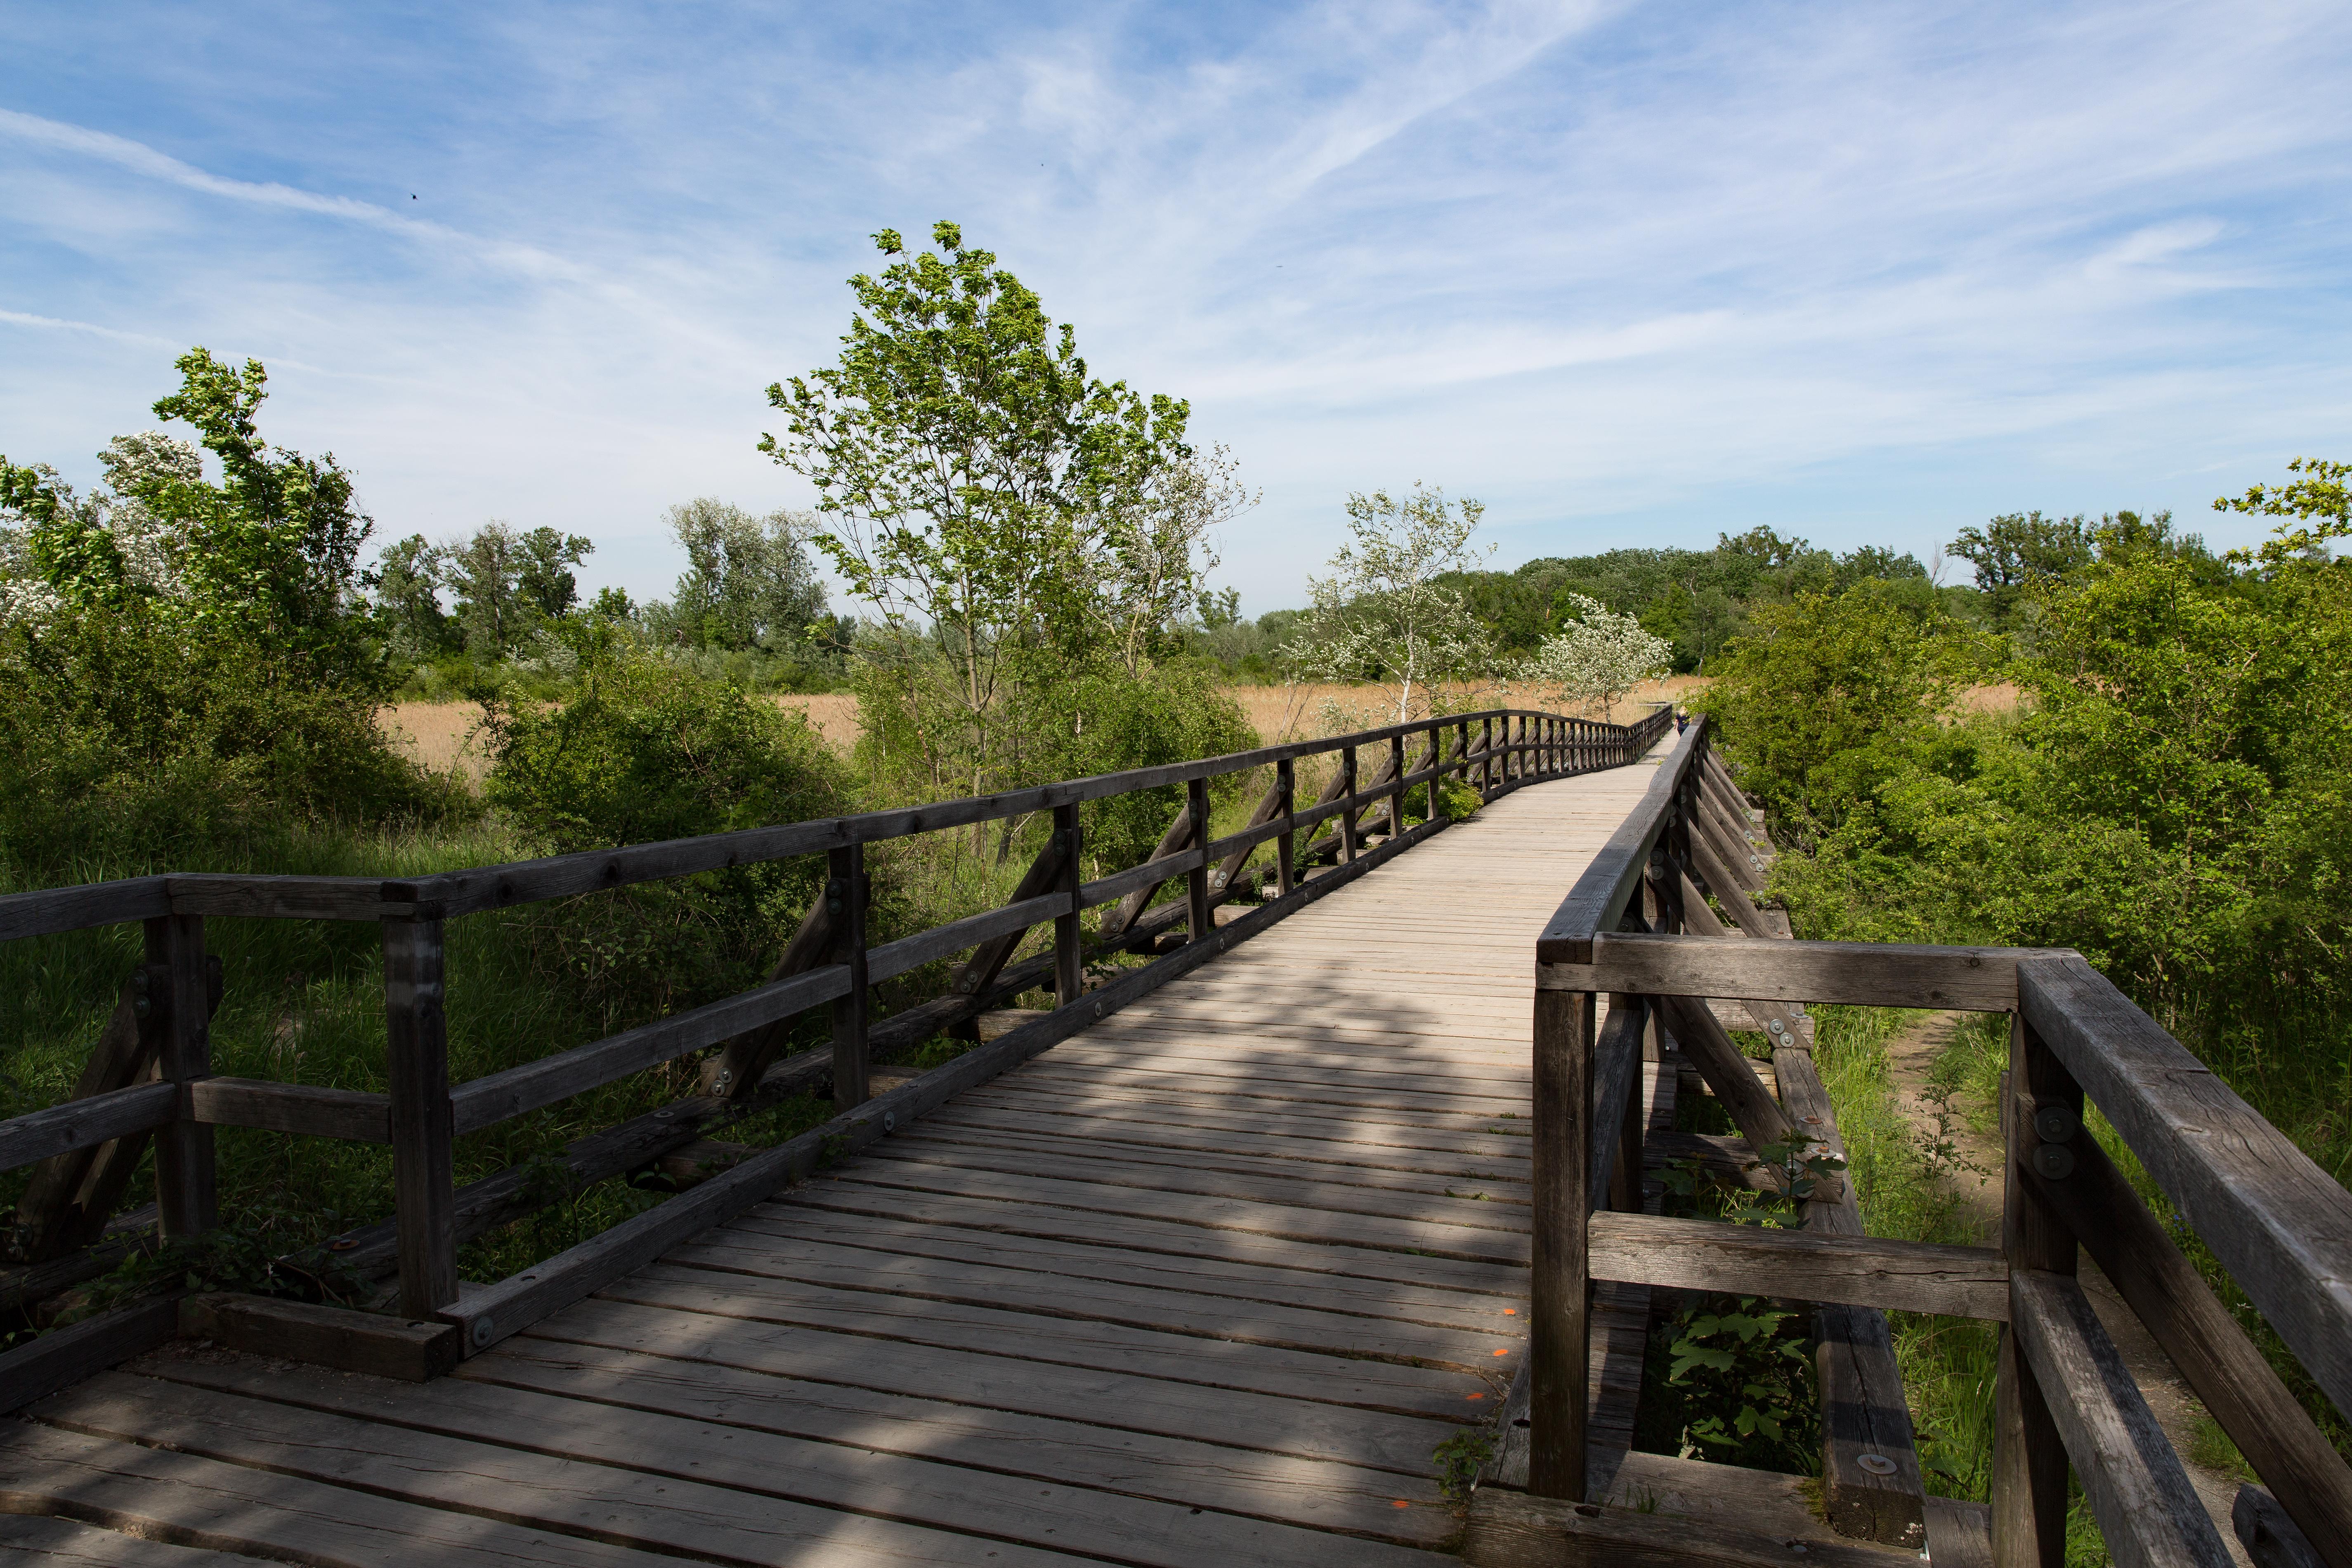 Filenationalpark Donau Auen Lobau Josefsteg Mai 2016 02jpg